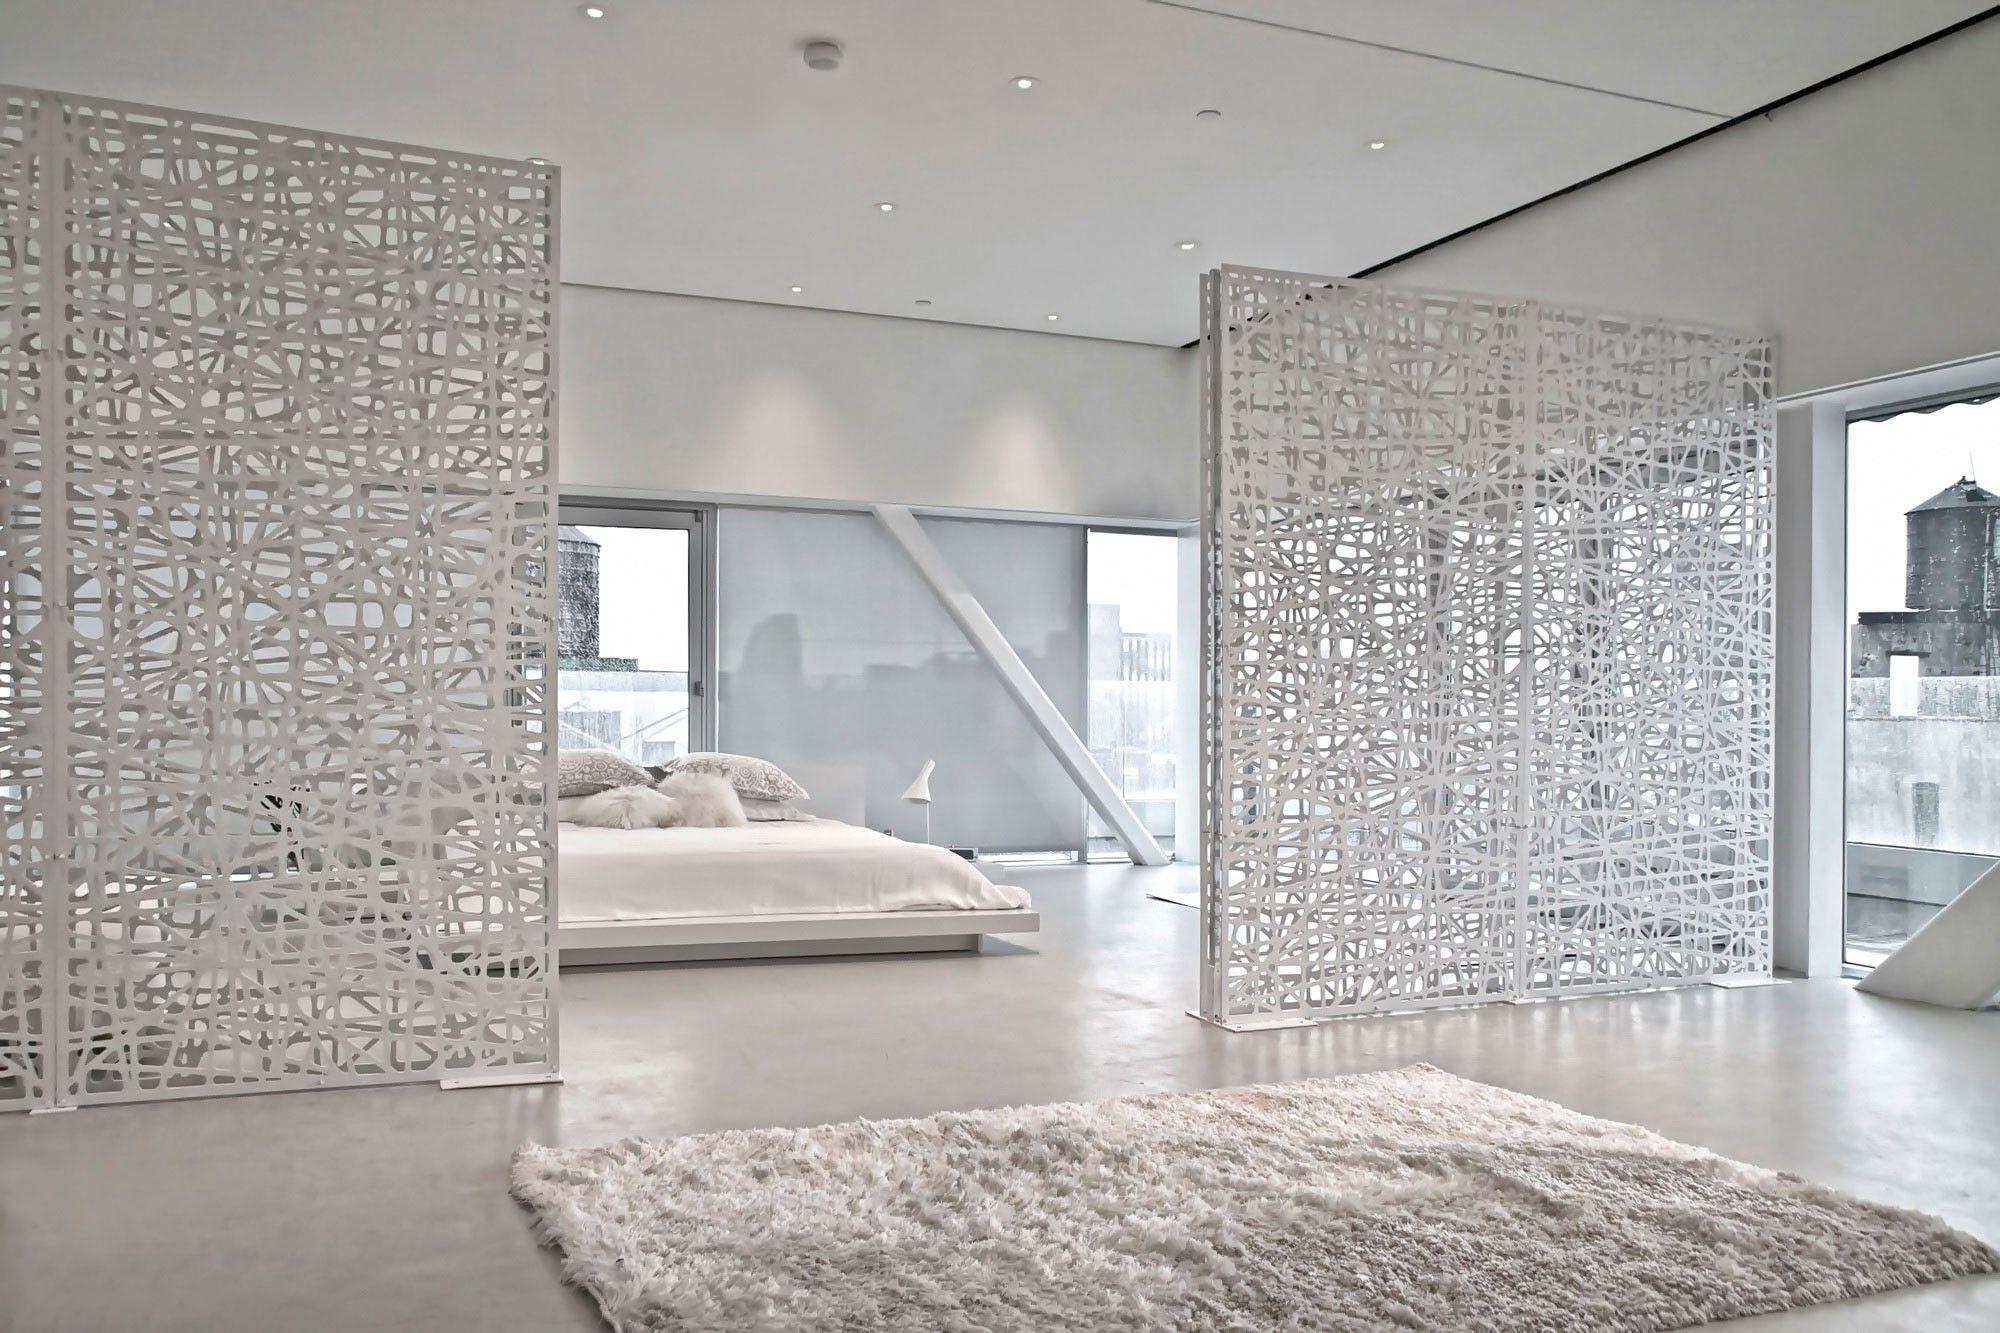 Decorative Screen Room Dividers Separate Living Room And Bedroom In Open Loft Apartment Freestanding Screens Are Ea Diy Room Divider Bedroom Diy Room Divider